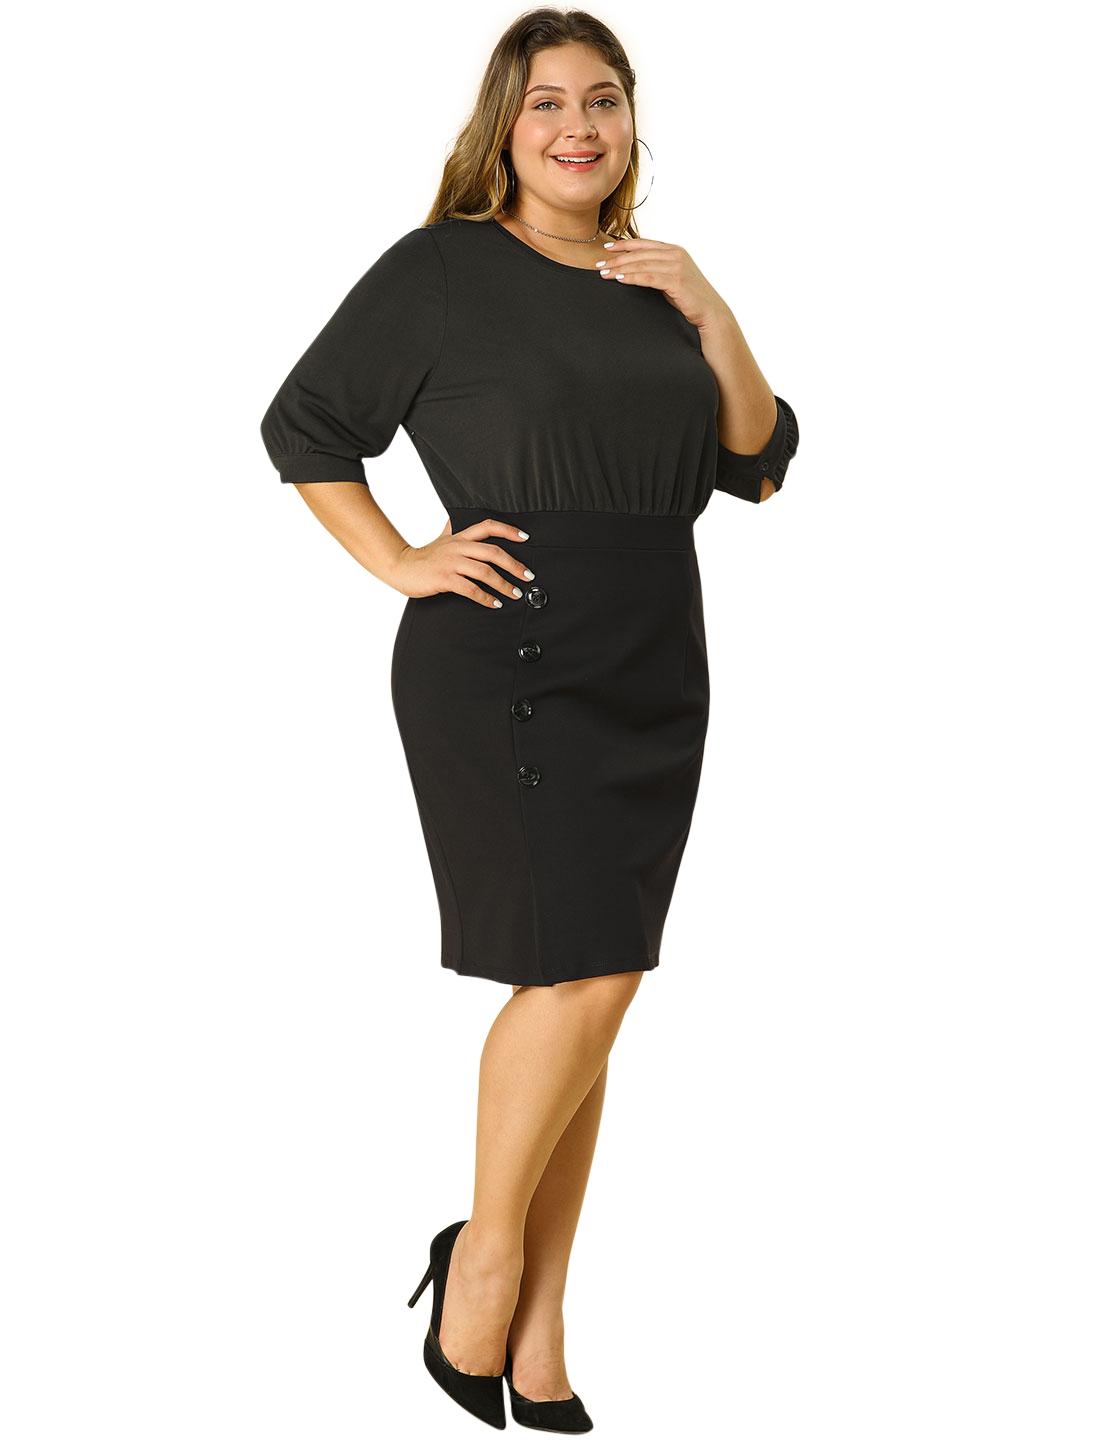 Women's Plus Size Office Work Bodycon Button Pencil Dress Black 2X